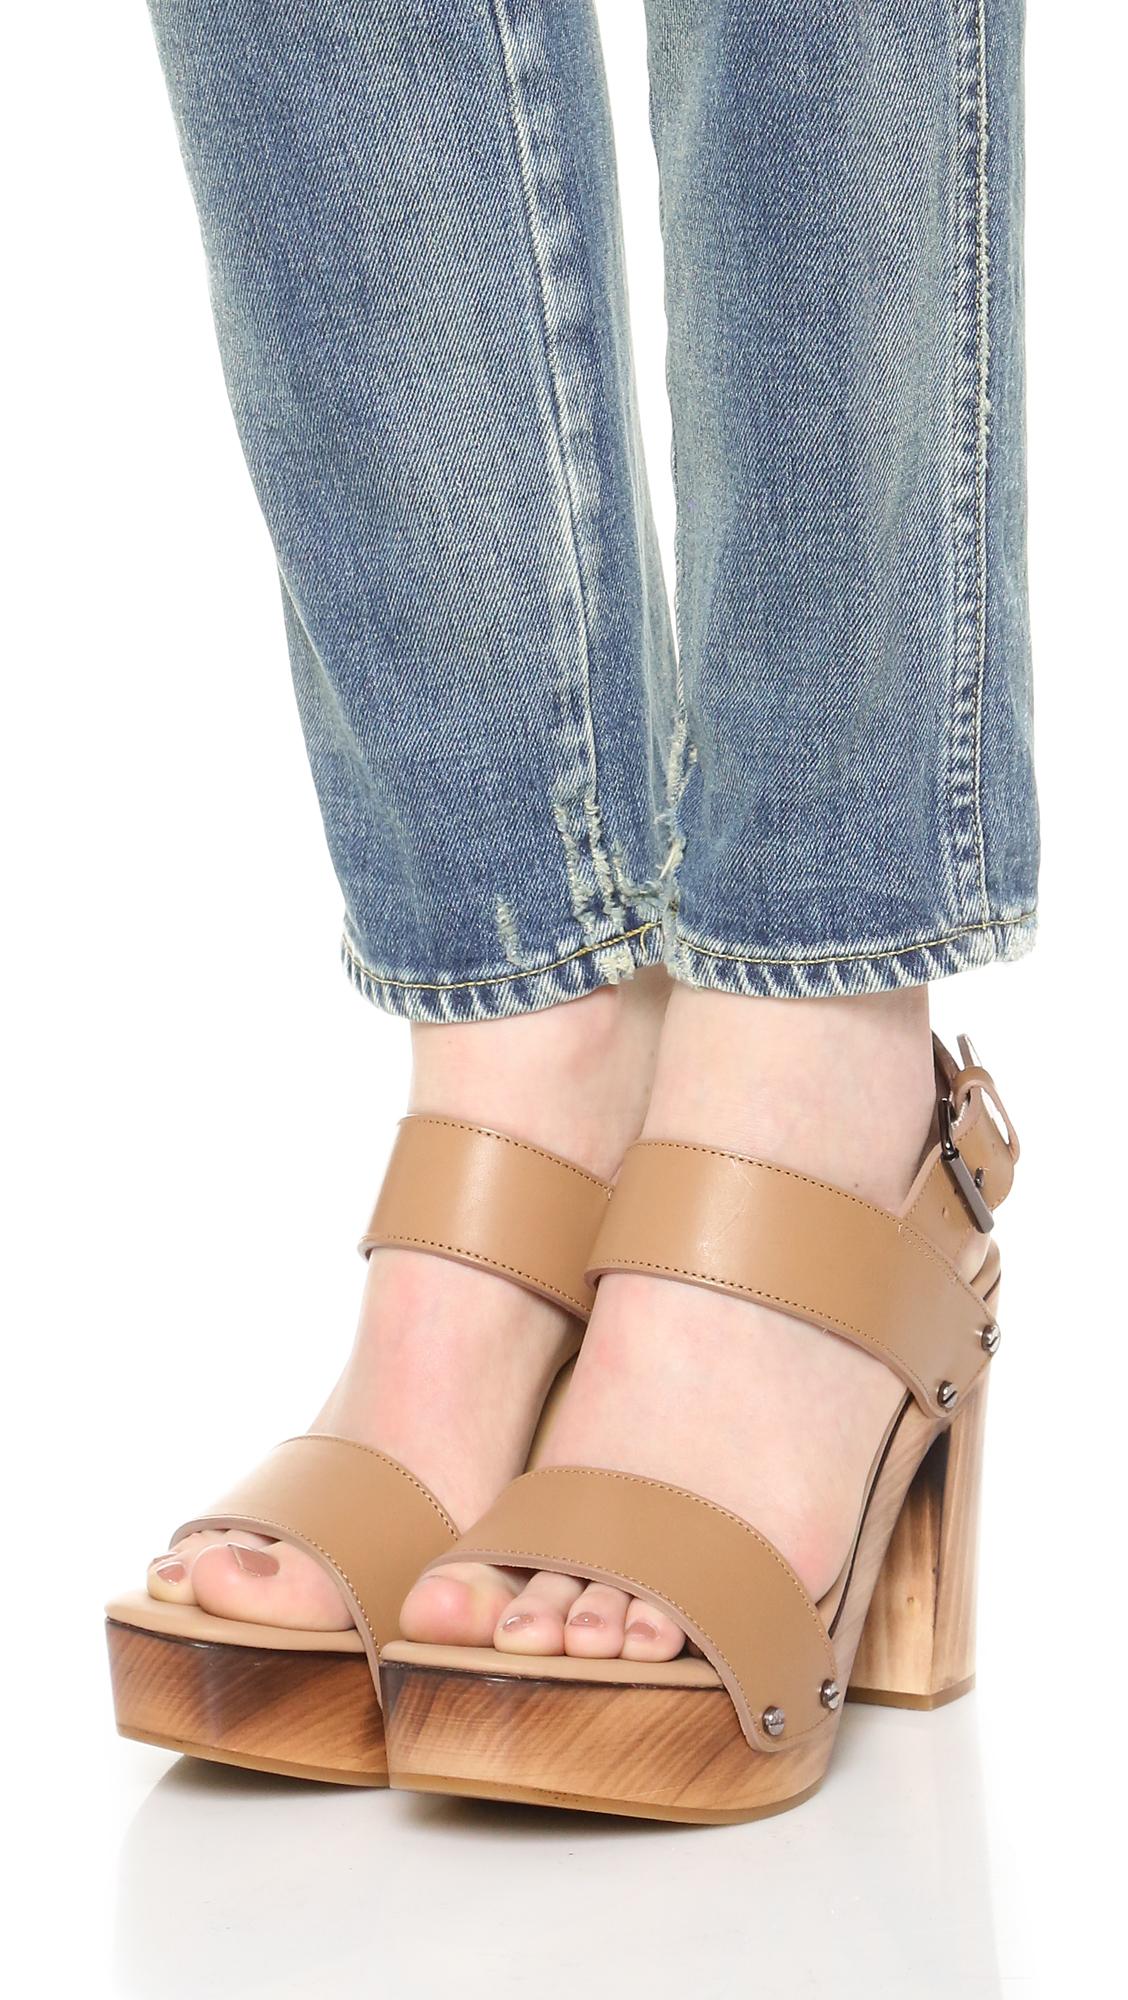 Solange Sandals cross strap sandals discount nicekicks sale comfortable YD1ZOuXT